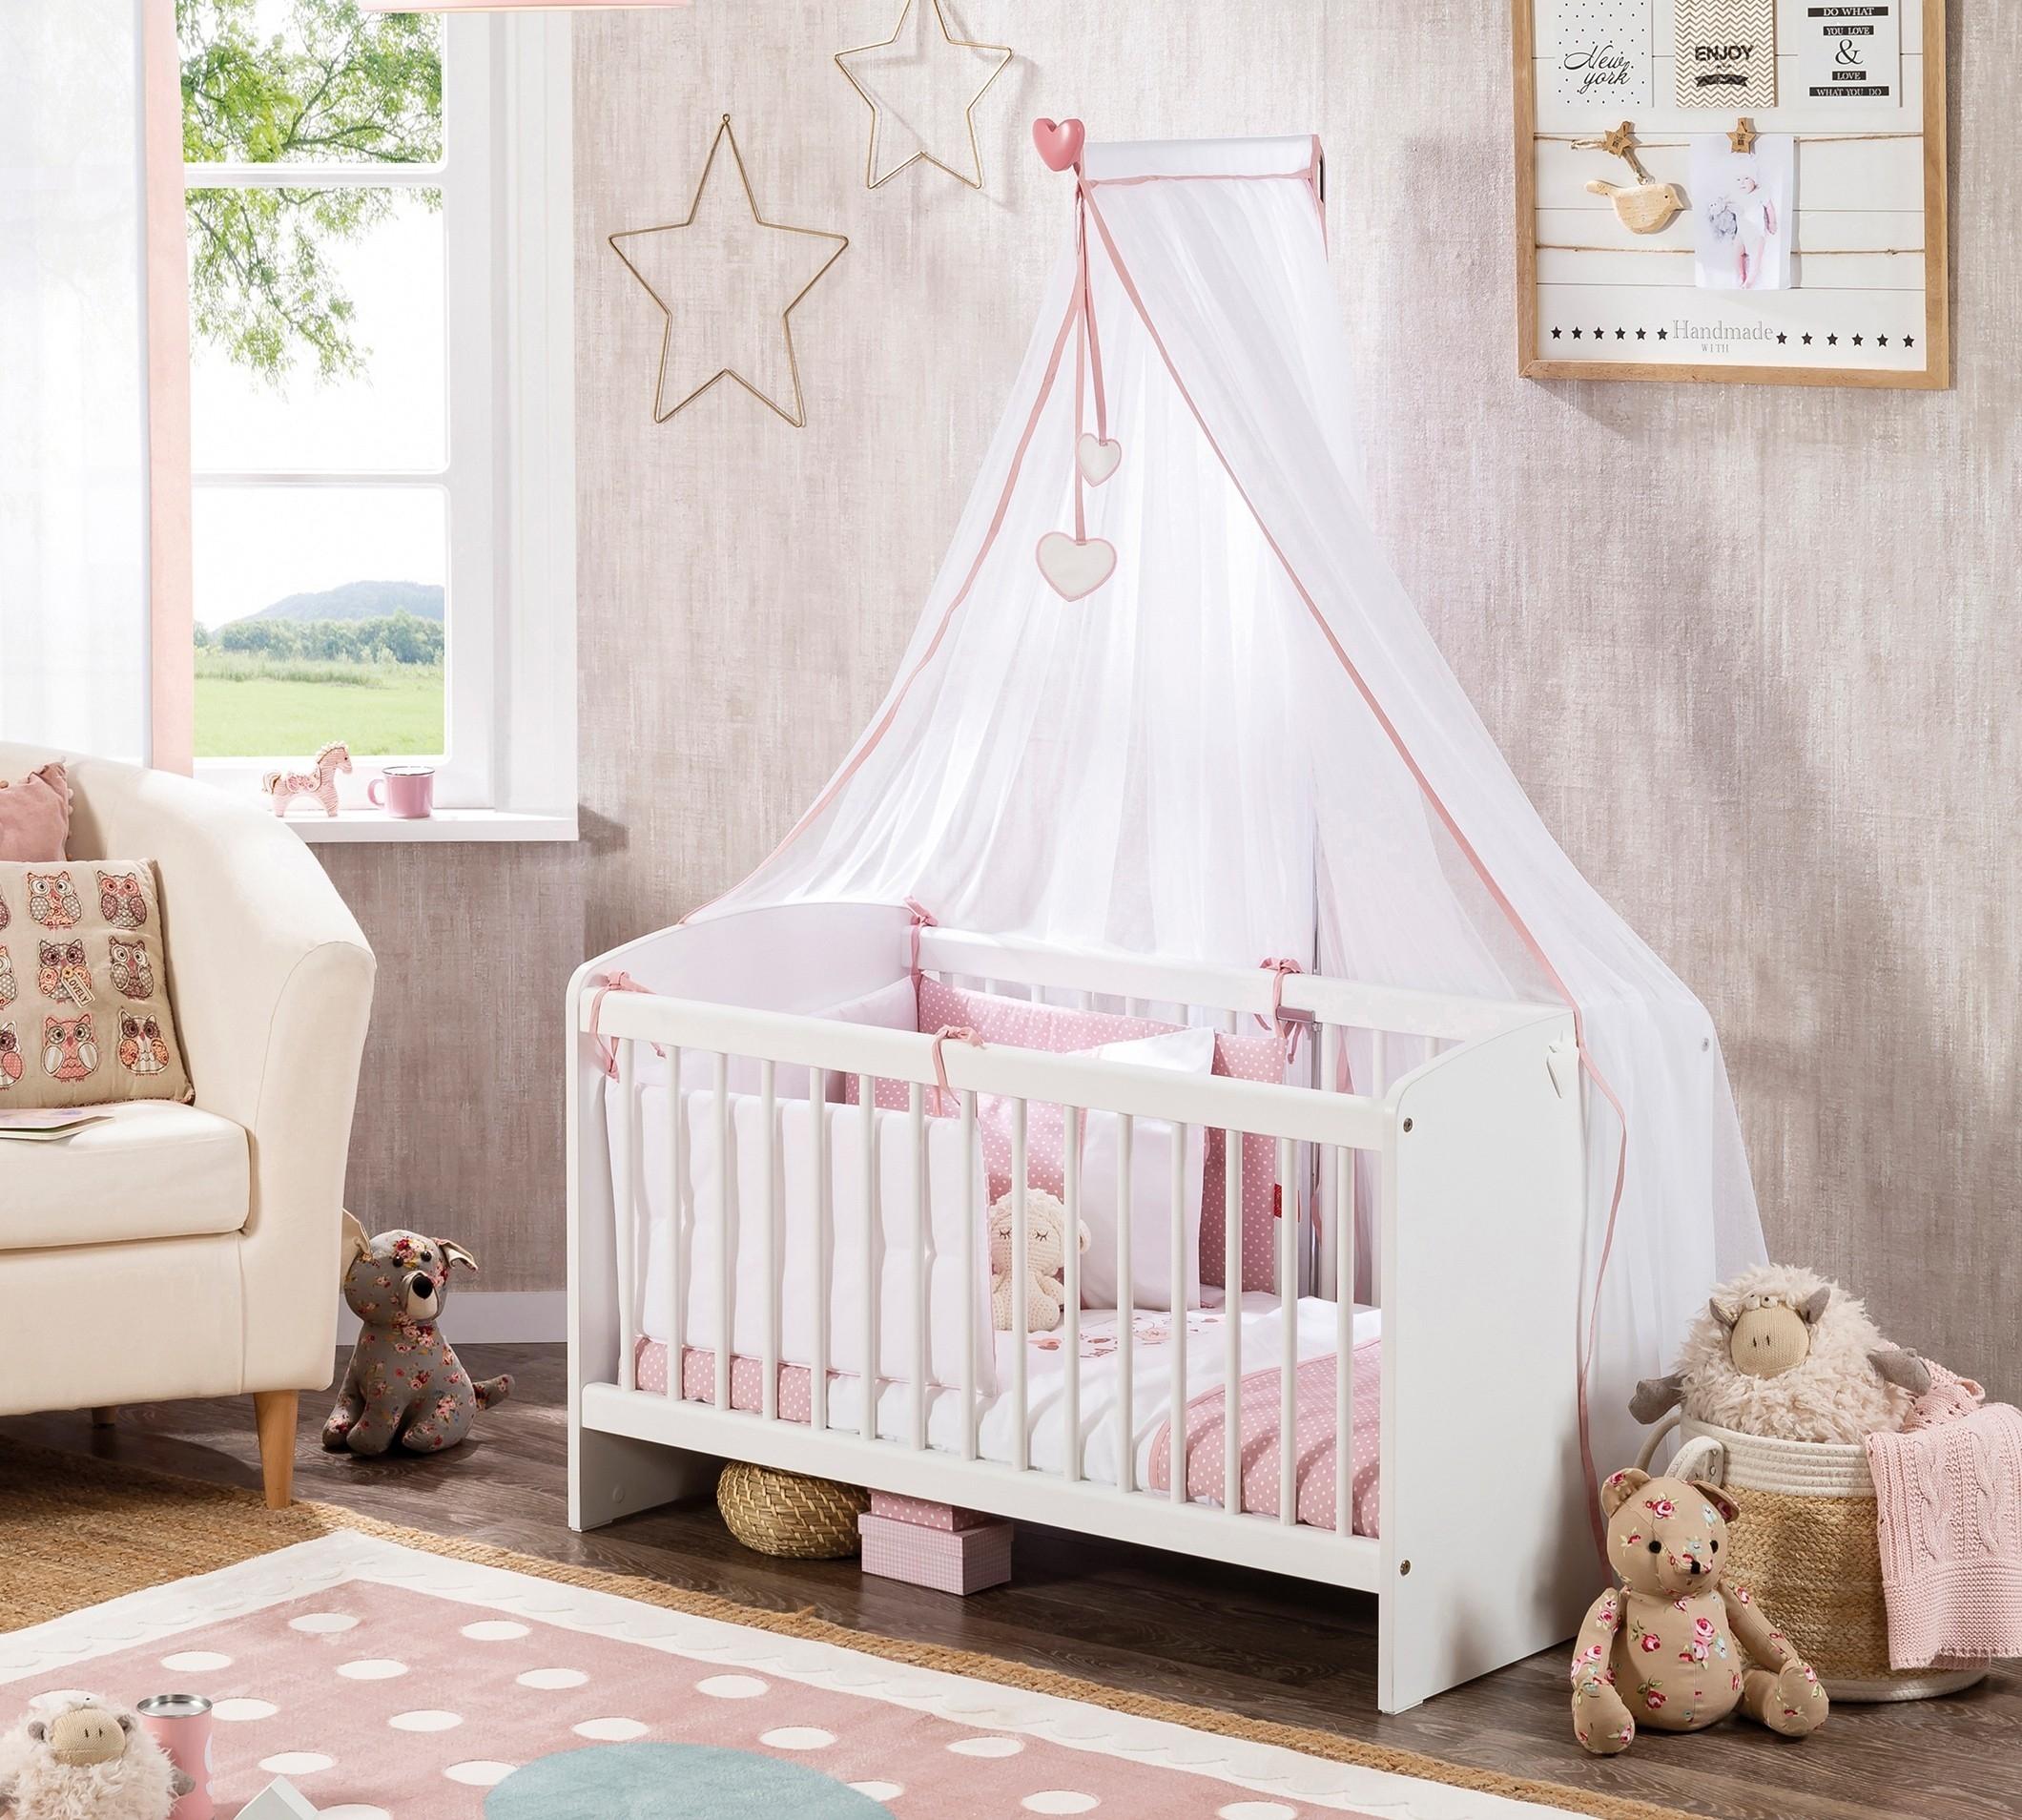 Patut din pal pentru bebe Cradle Baby Alb 100 x 50 cm